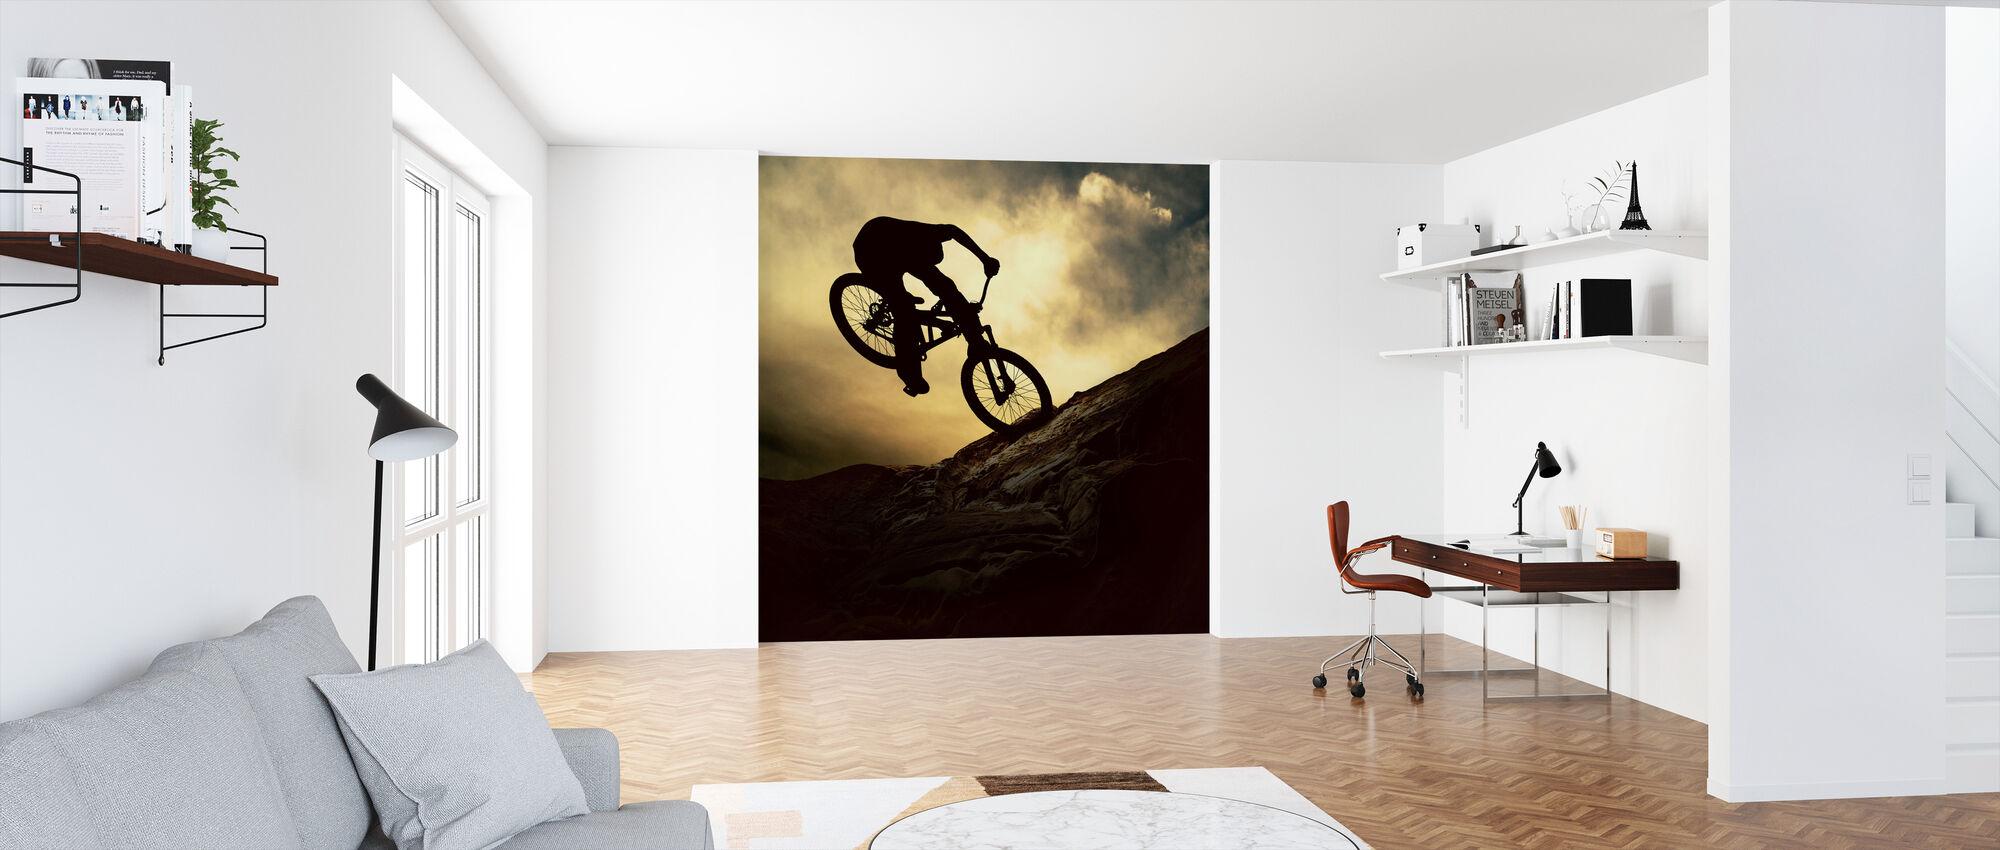 Mountainbike rytter - Tapet - Kontor